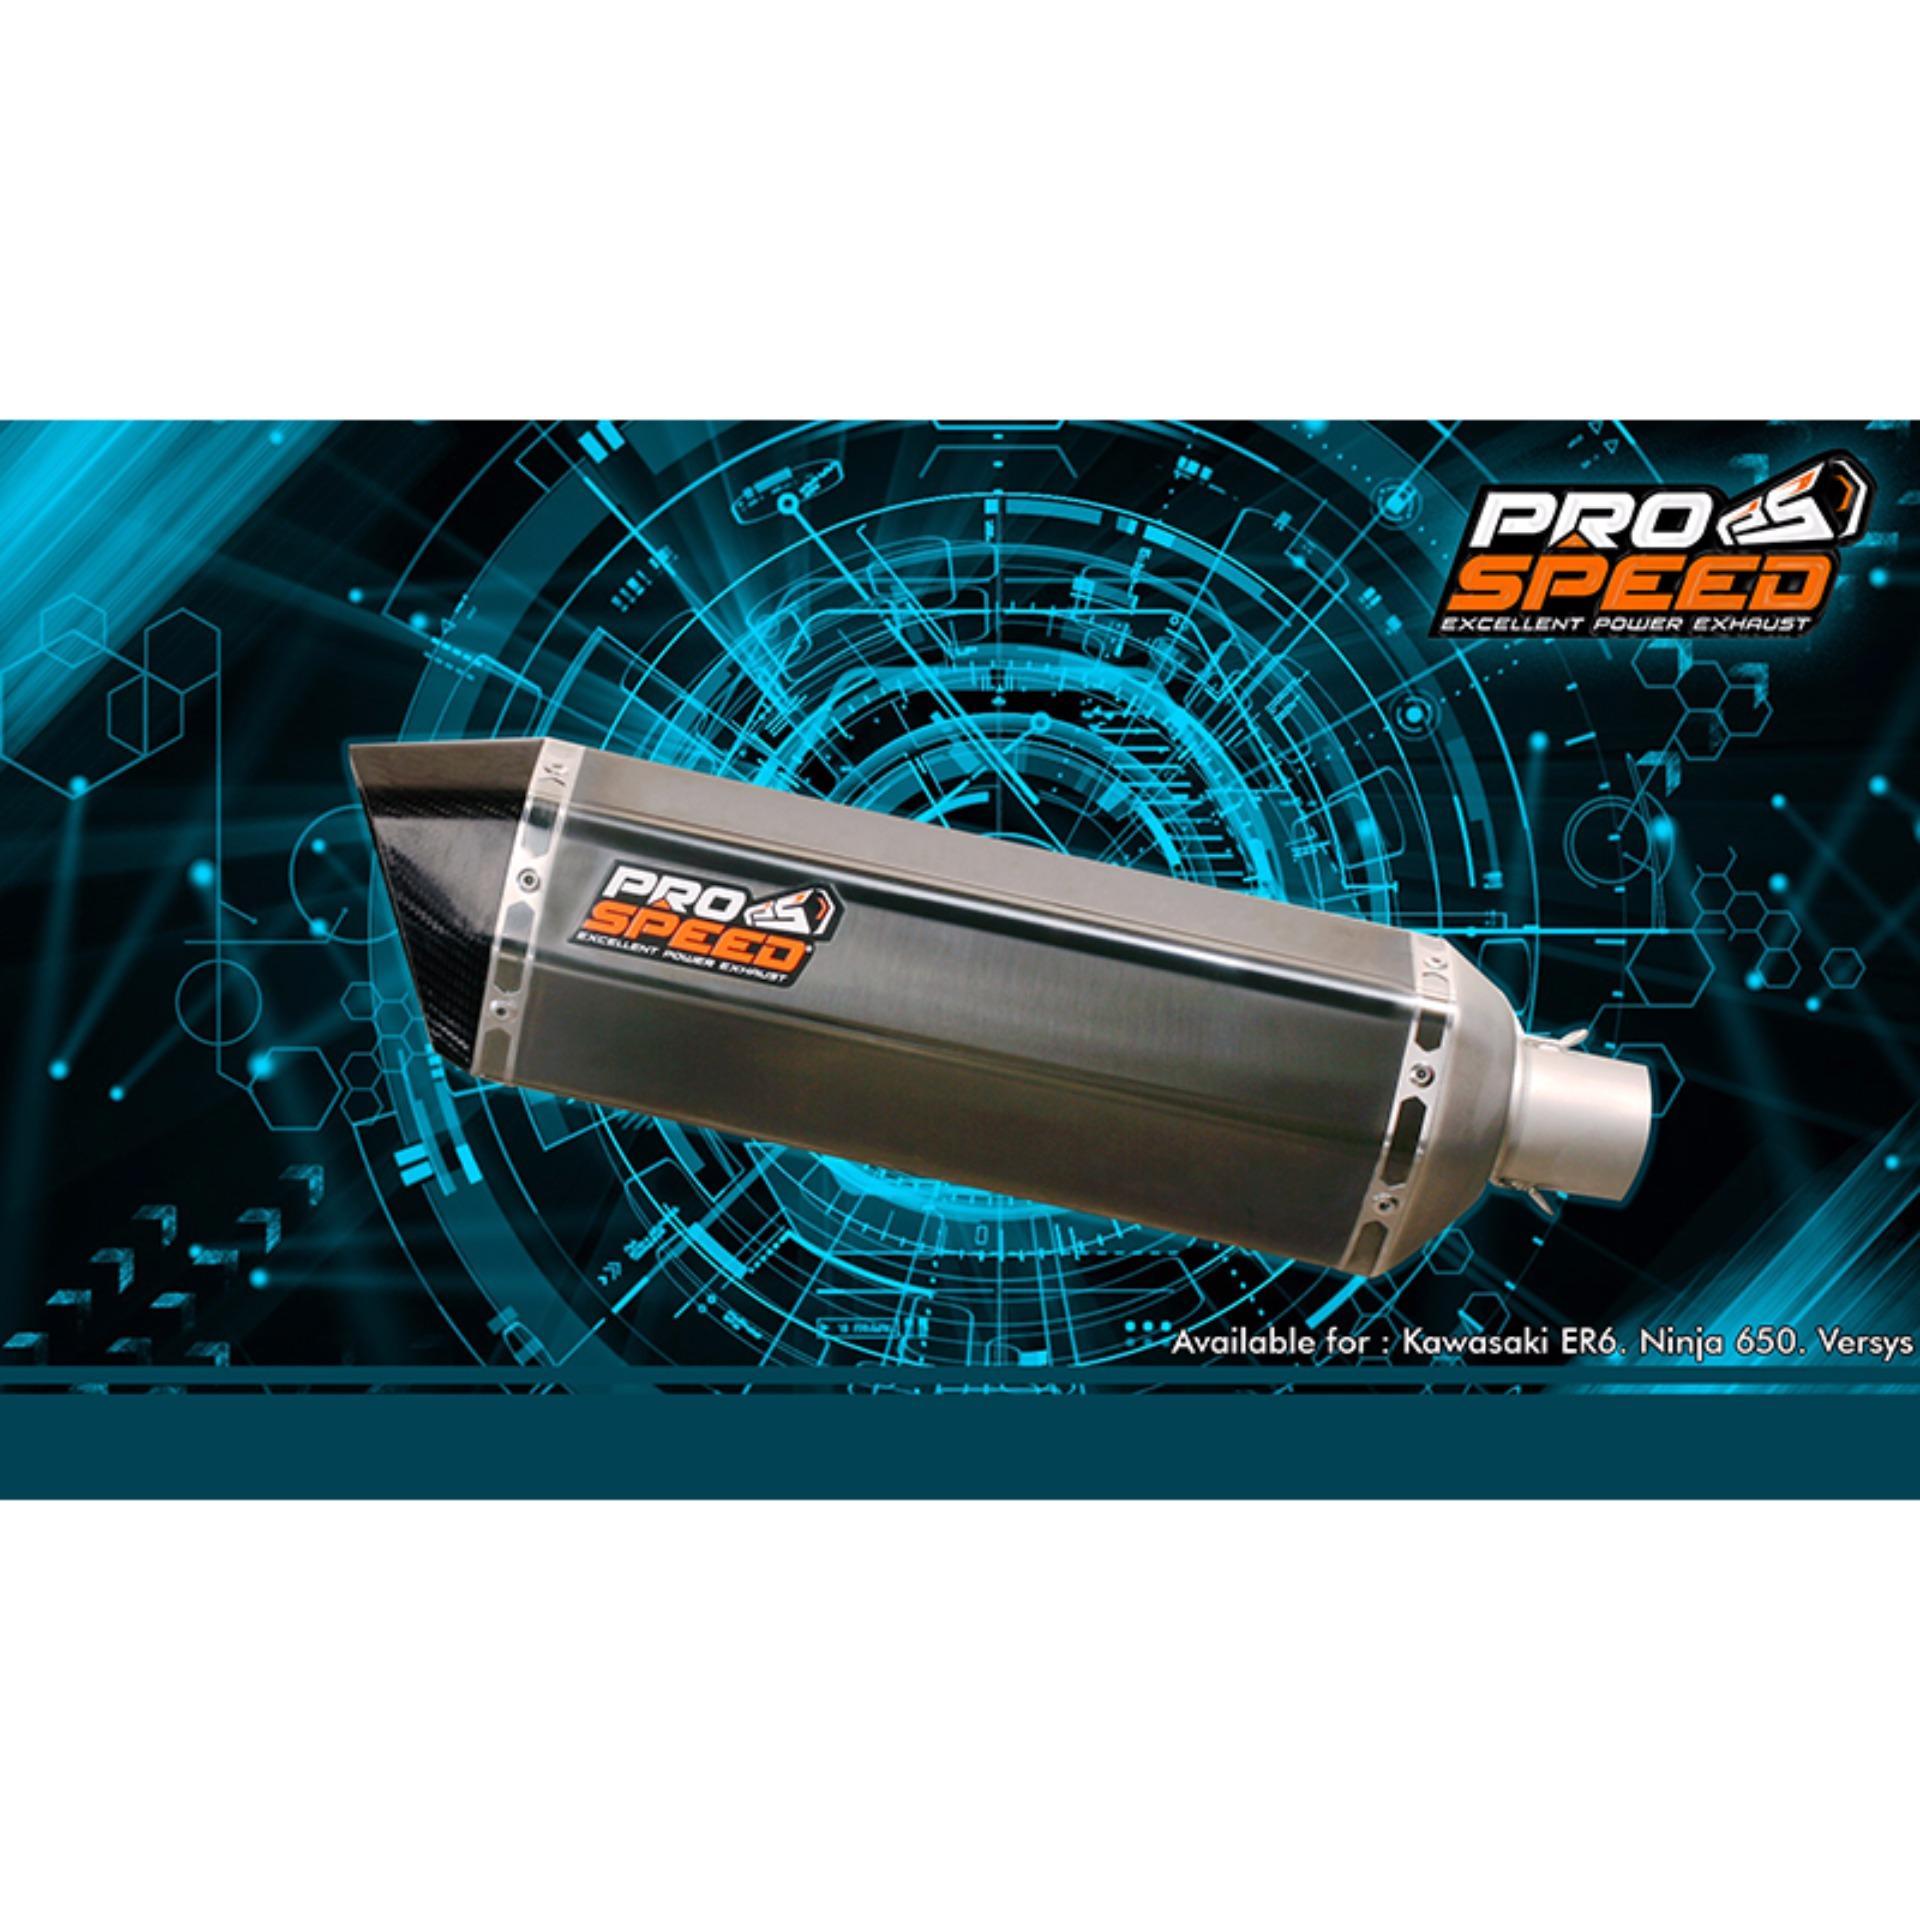 Belanja Murah Pro Speed Kawasaki Er6 Carbon Series Full System Prospeed Black Yamaha R25 Mt 25 Slip On